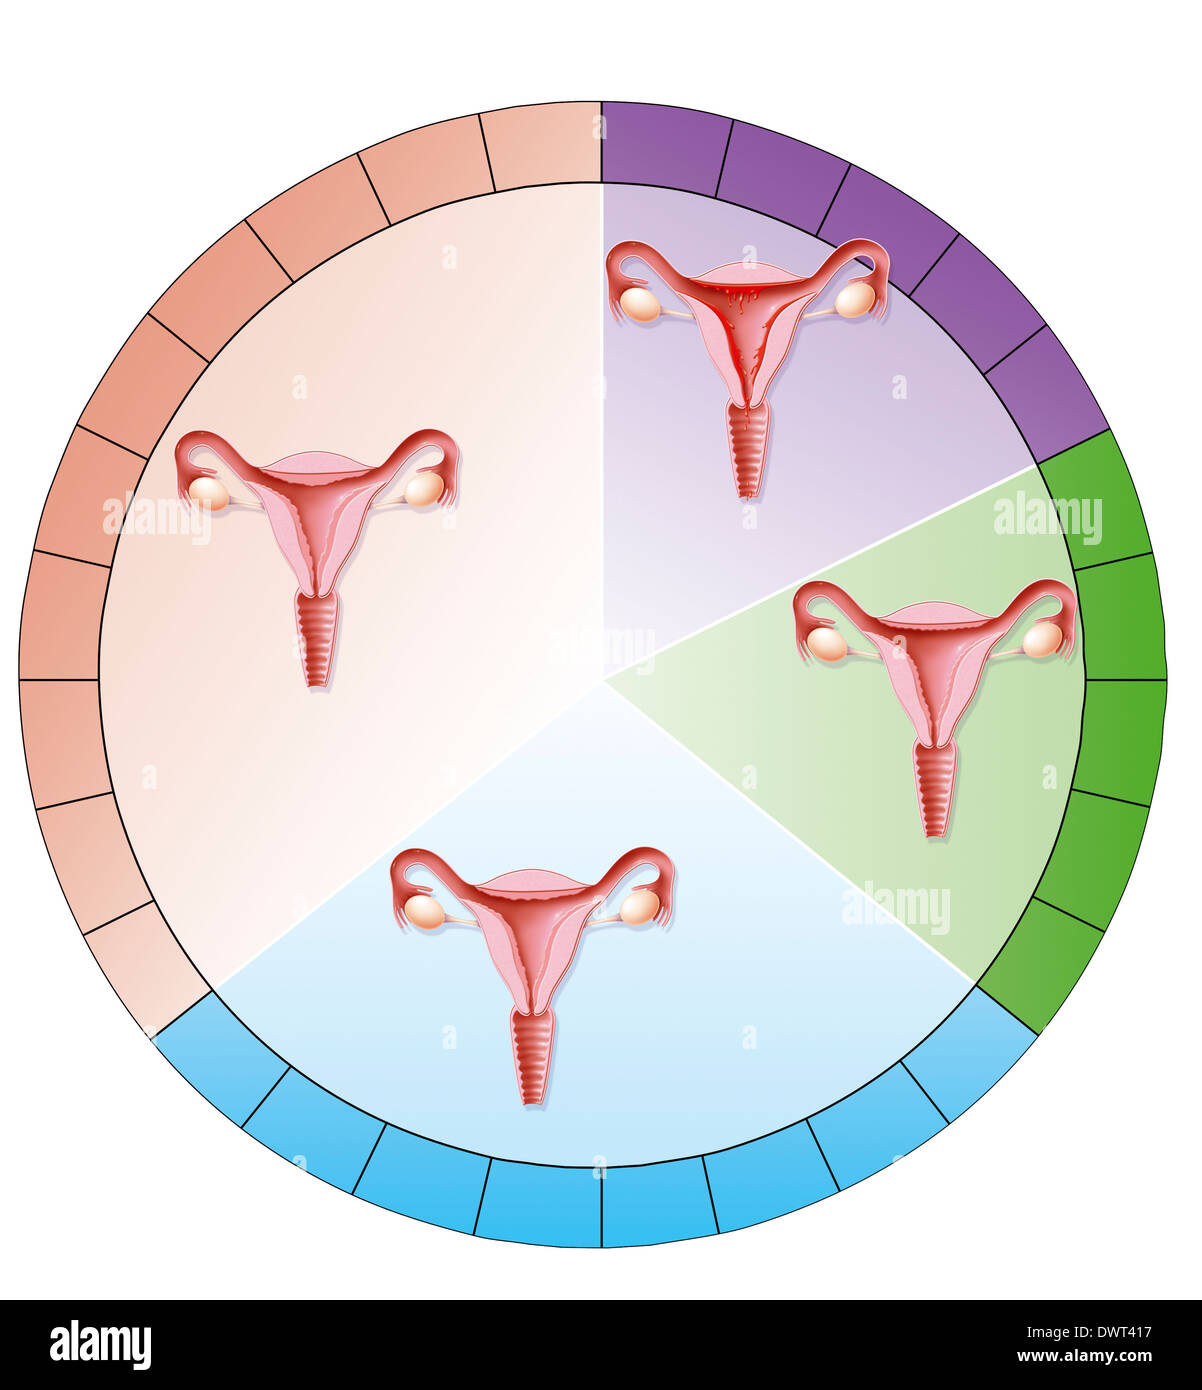 Ciclo menstrual, dibujo Imagen De Stock